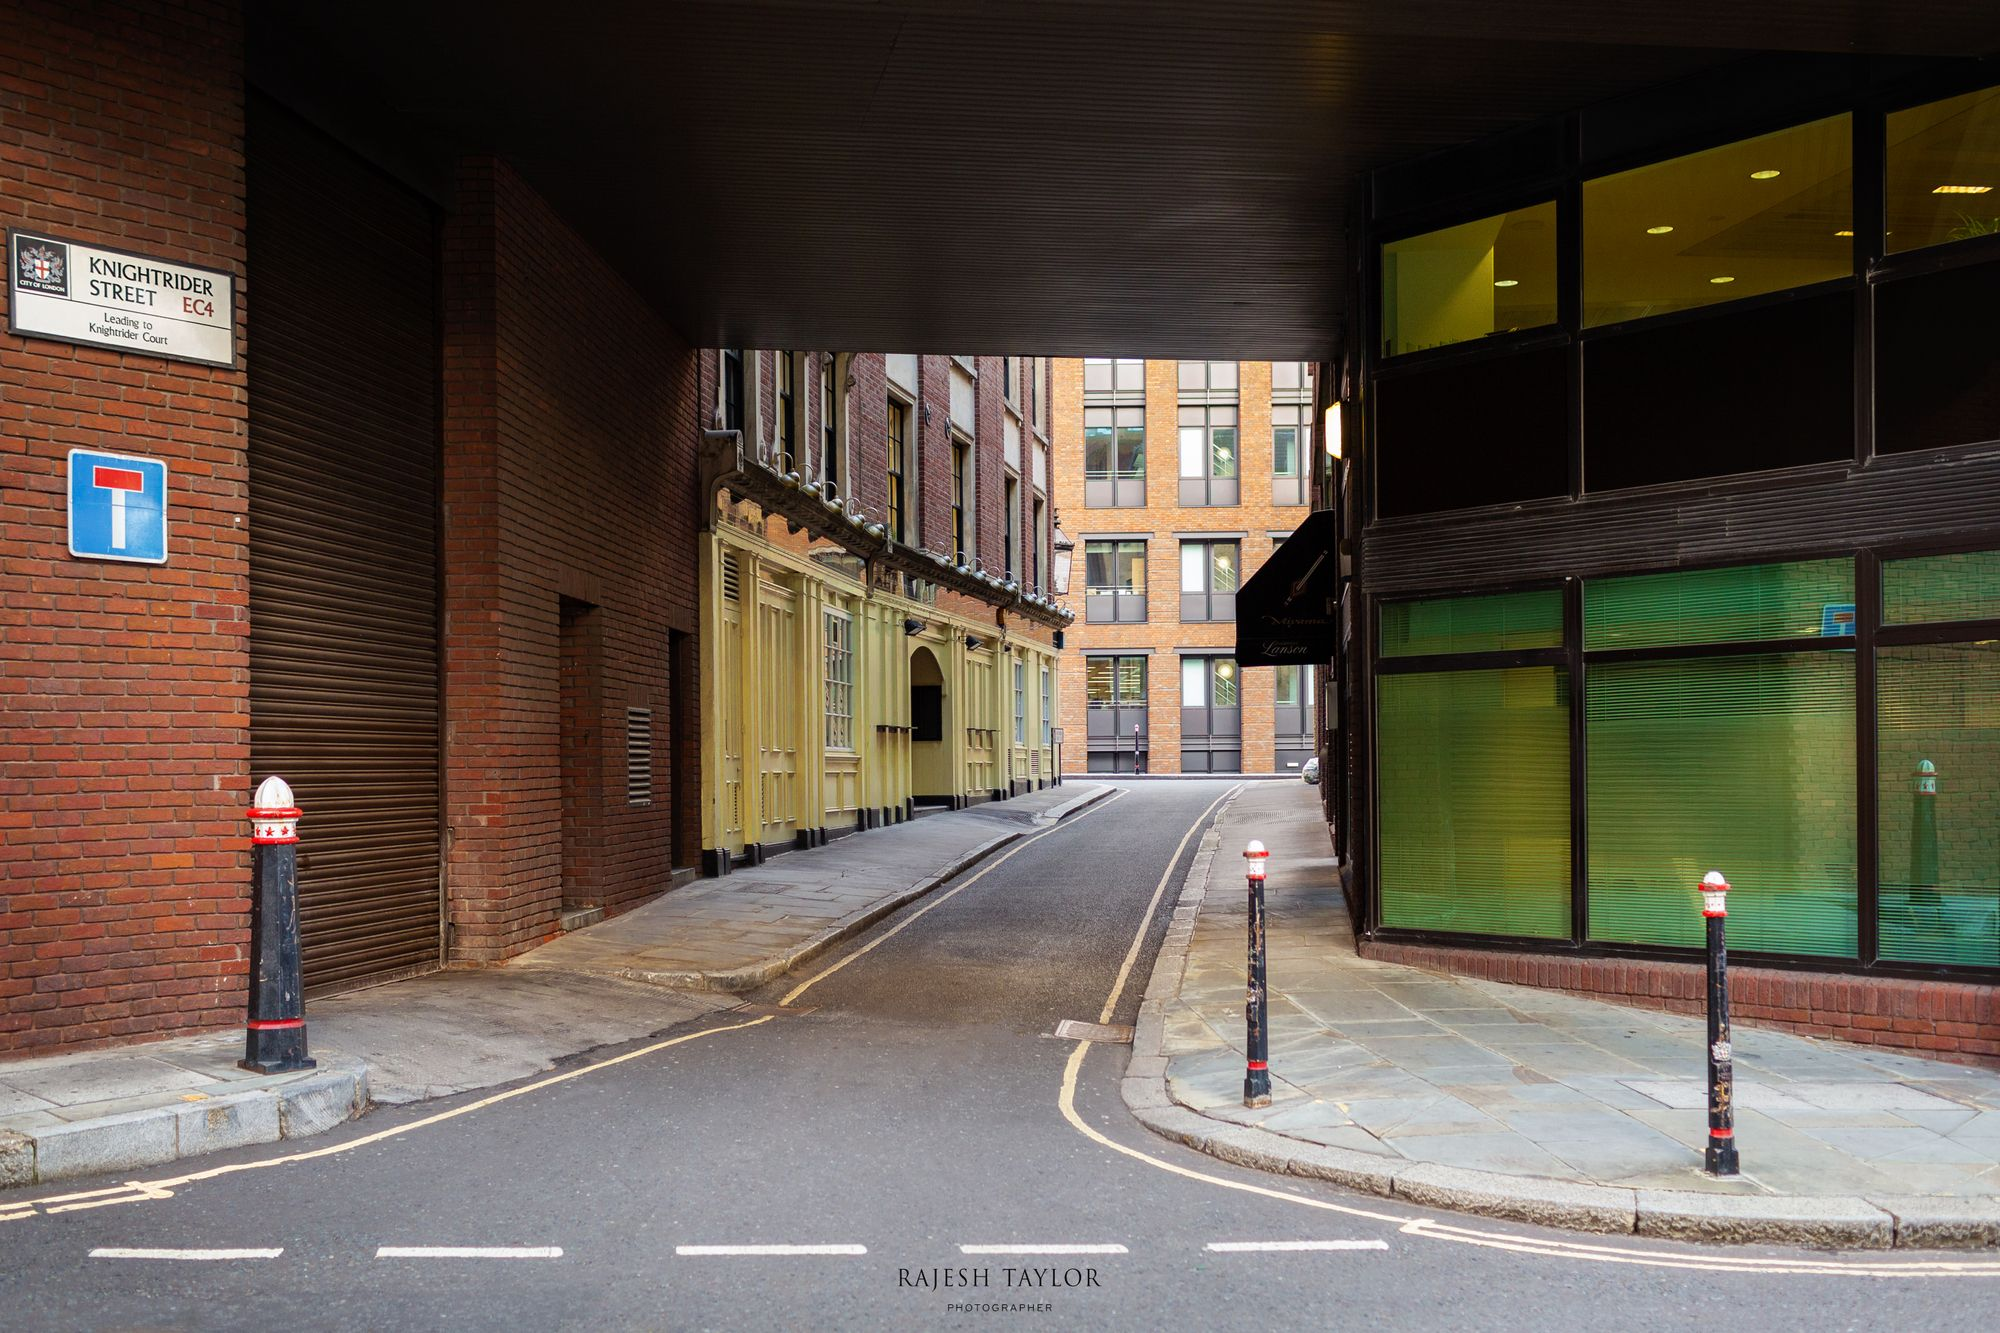 Knightrider Street underpass, City of London © Rajesh Taylor